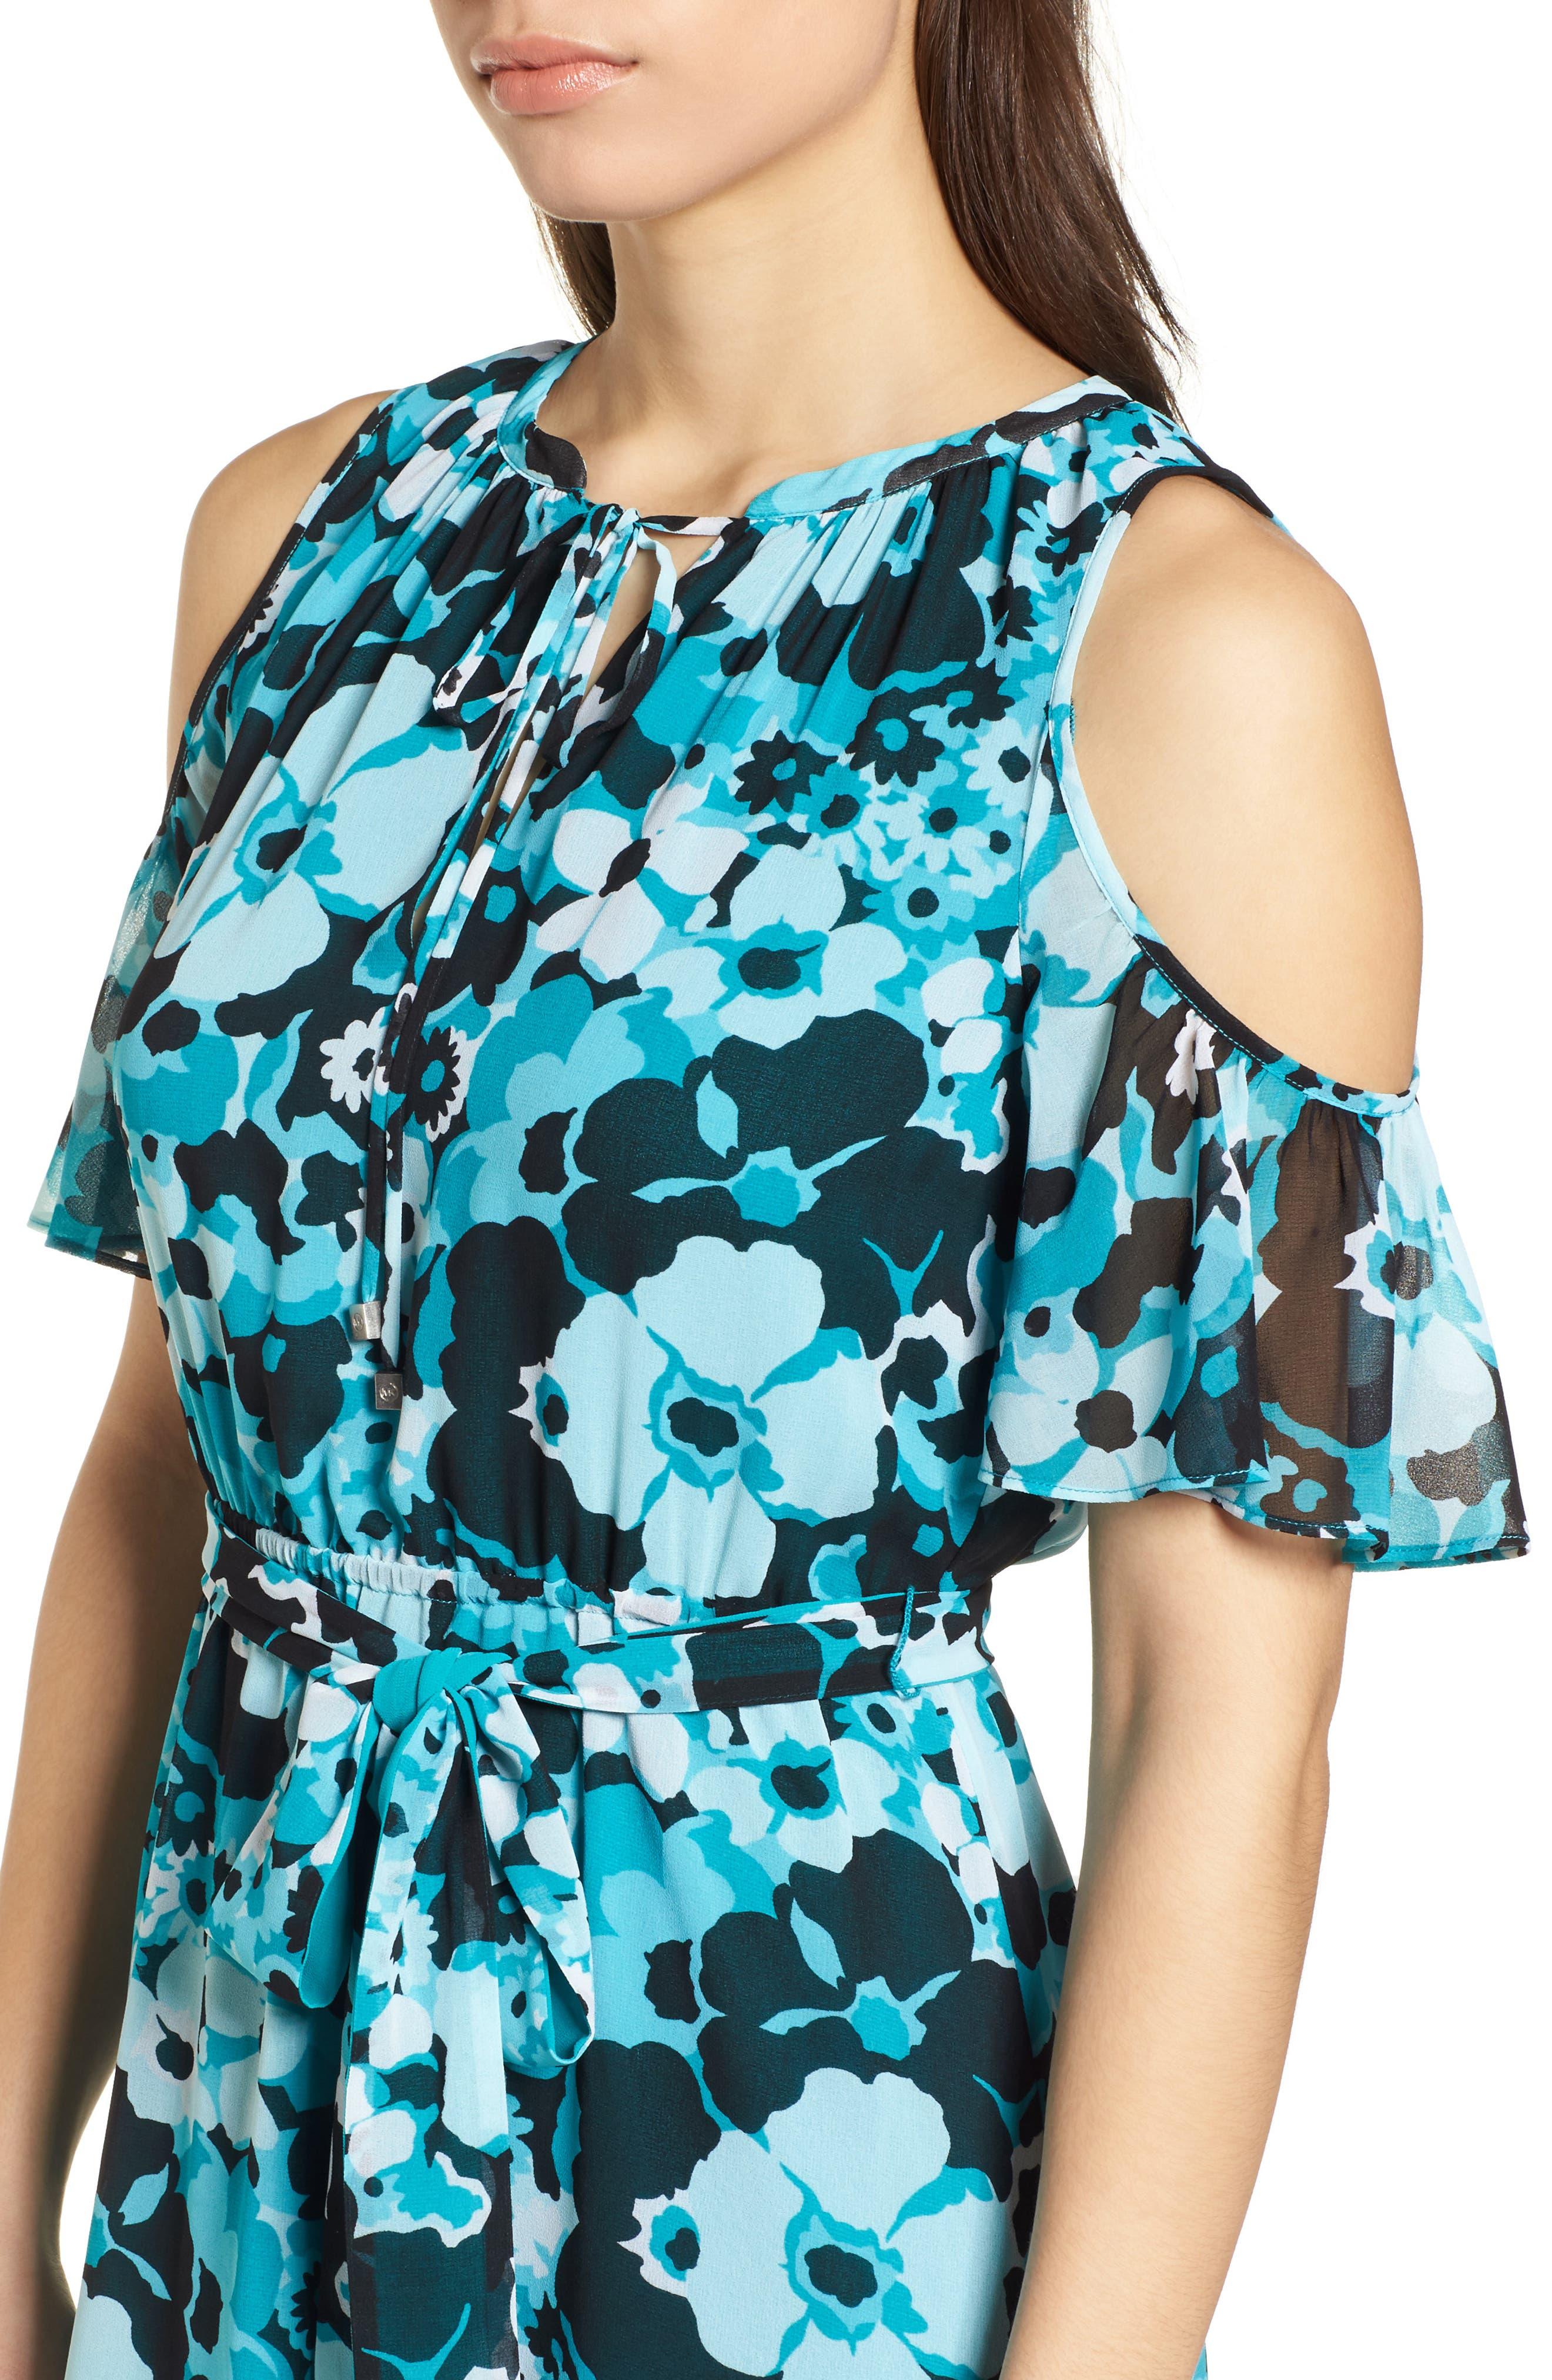 Spring Floral Maxi Dress,                             Alternate thumbnail 4, color,                             Tile Blue/ Black Multi